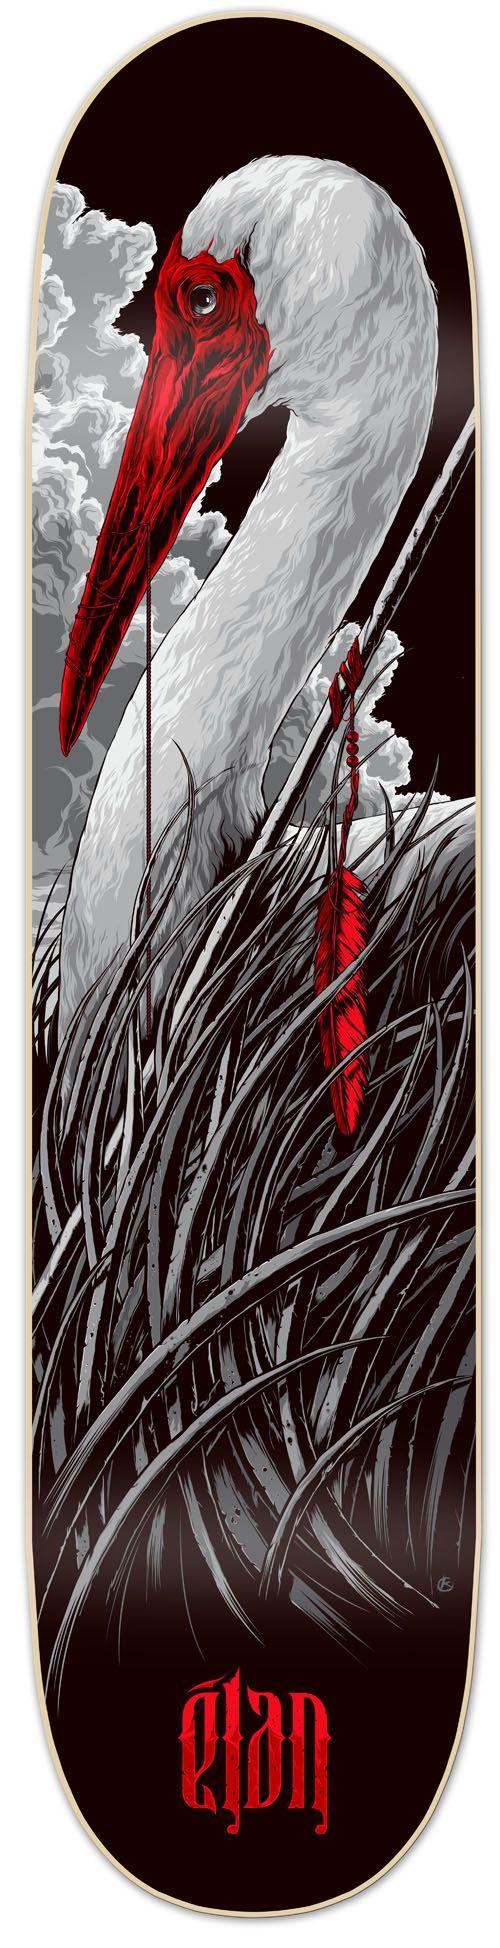 Elan Skateboard Deck | Ken Taylor